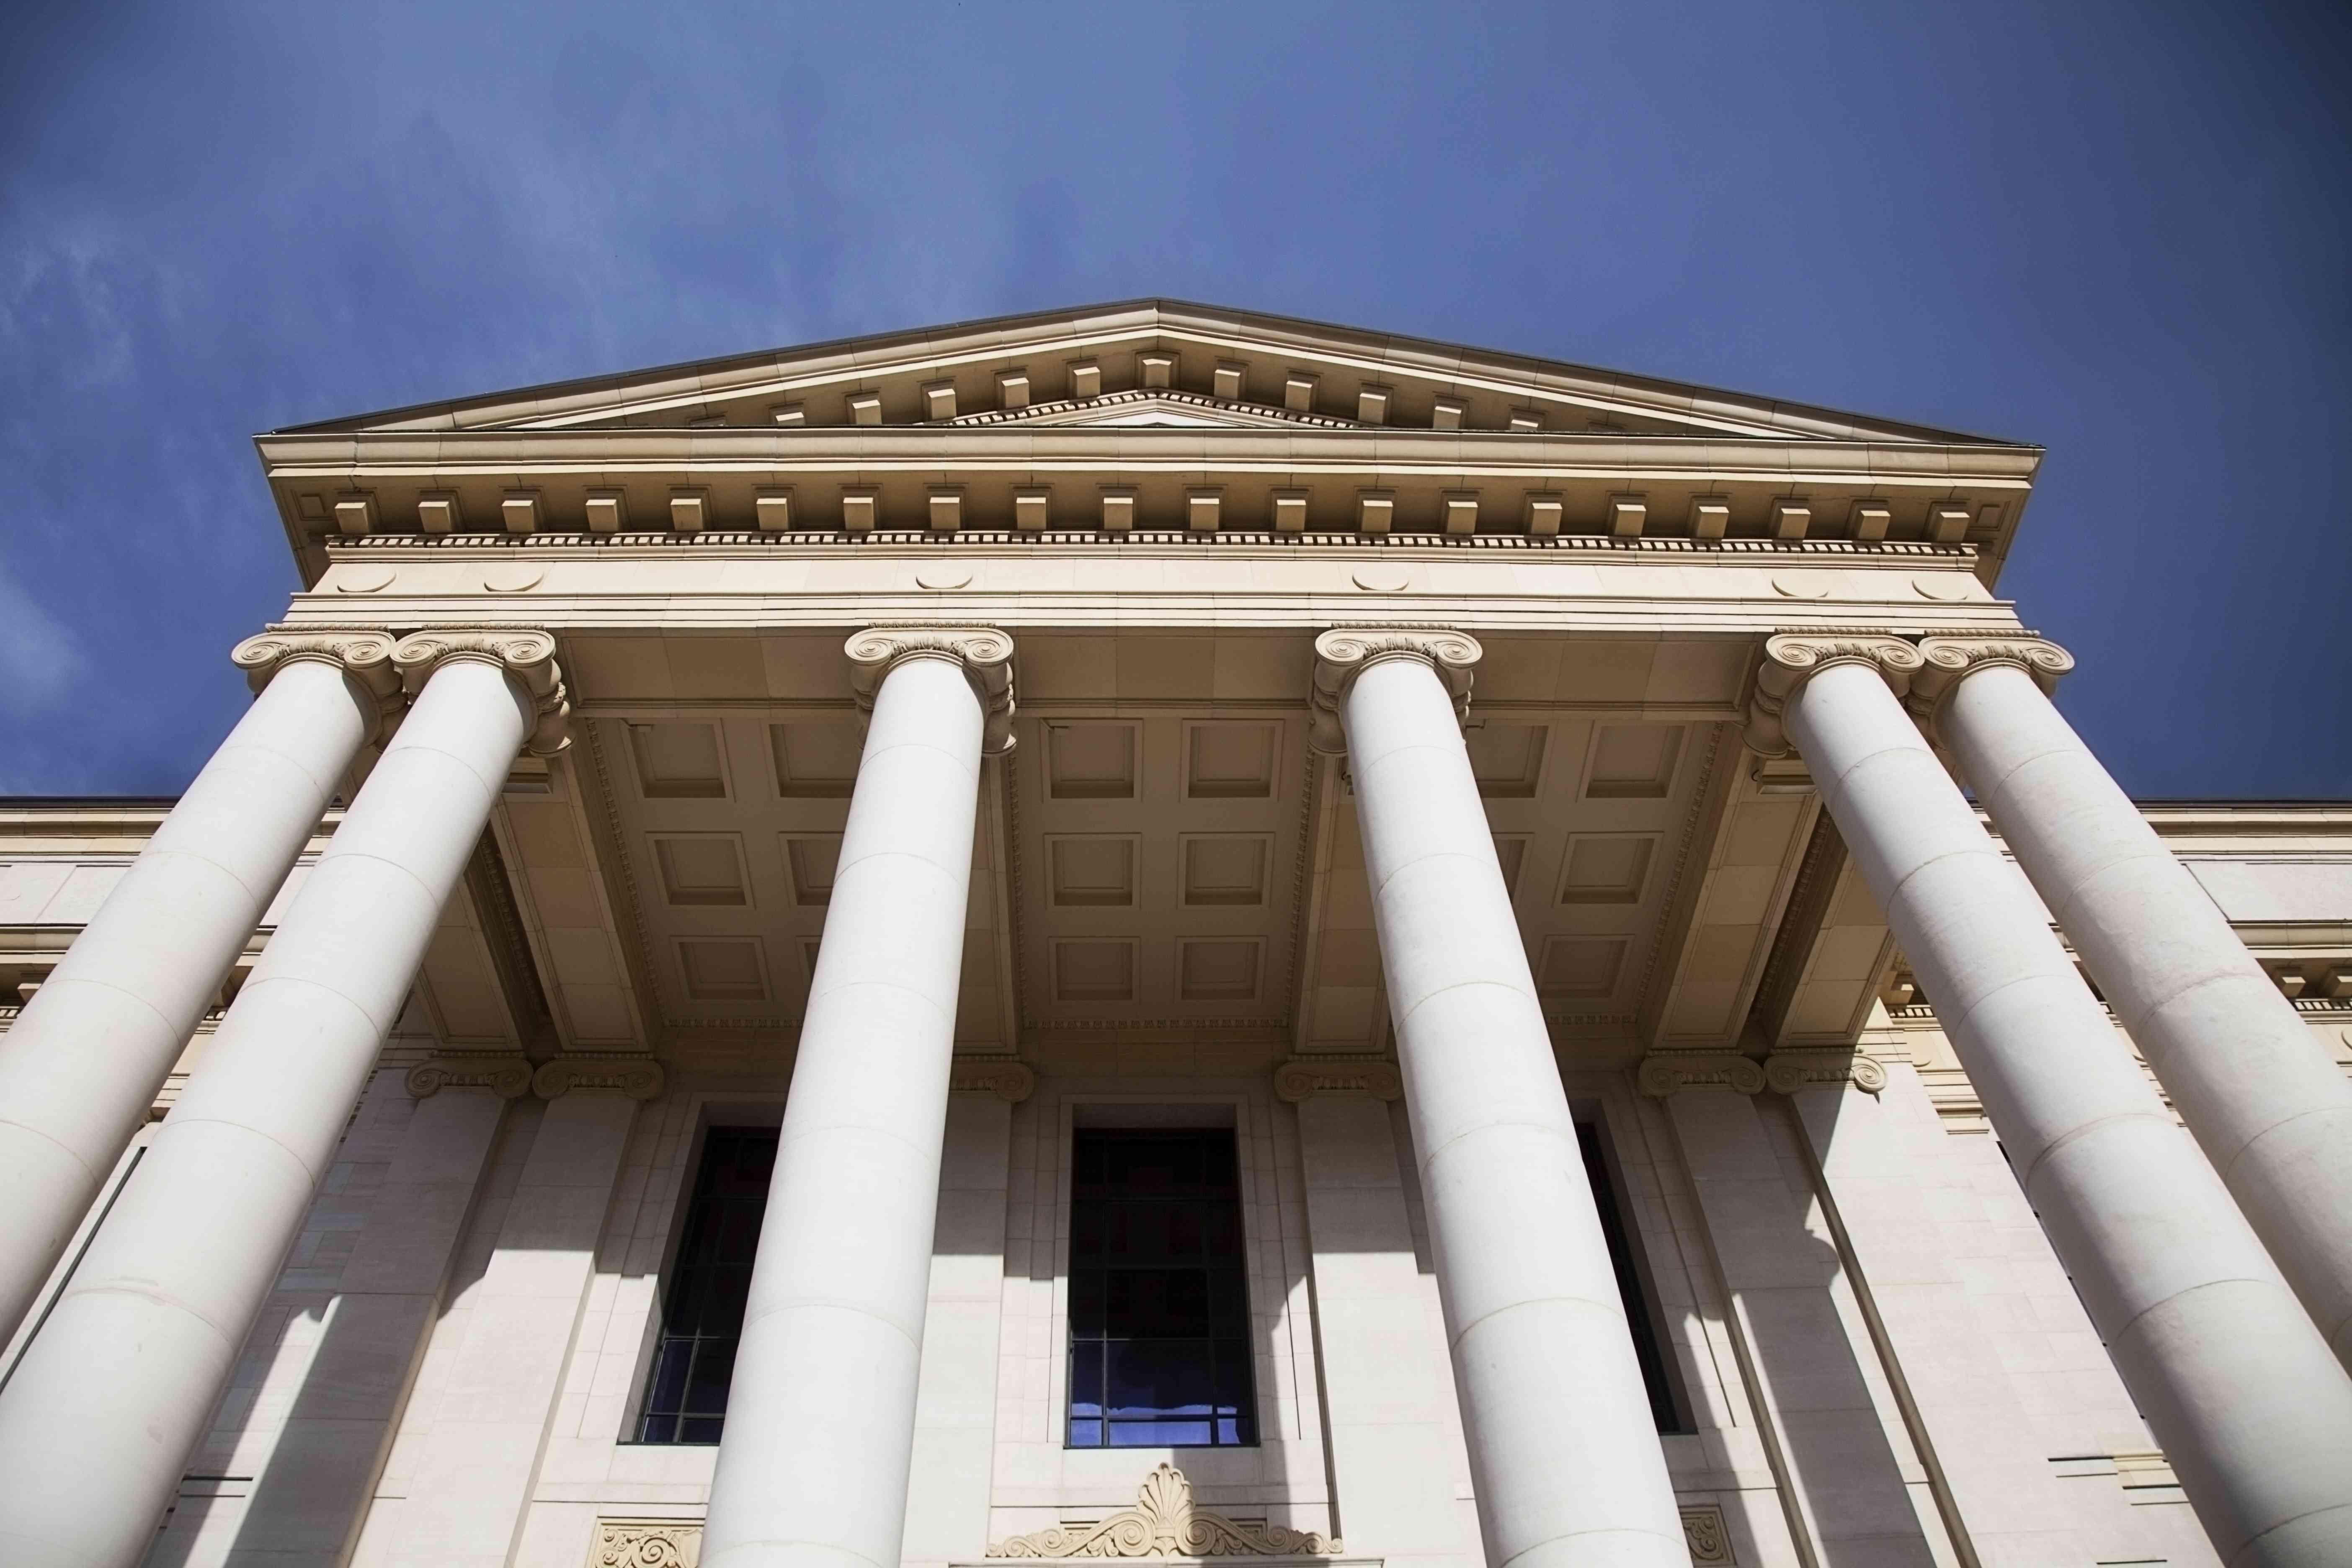 Beaux Arts/Neo-Classical Columns